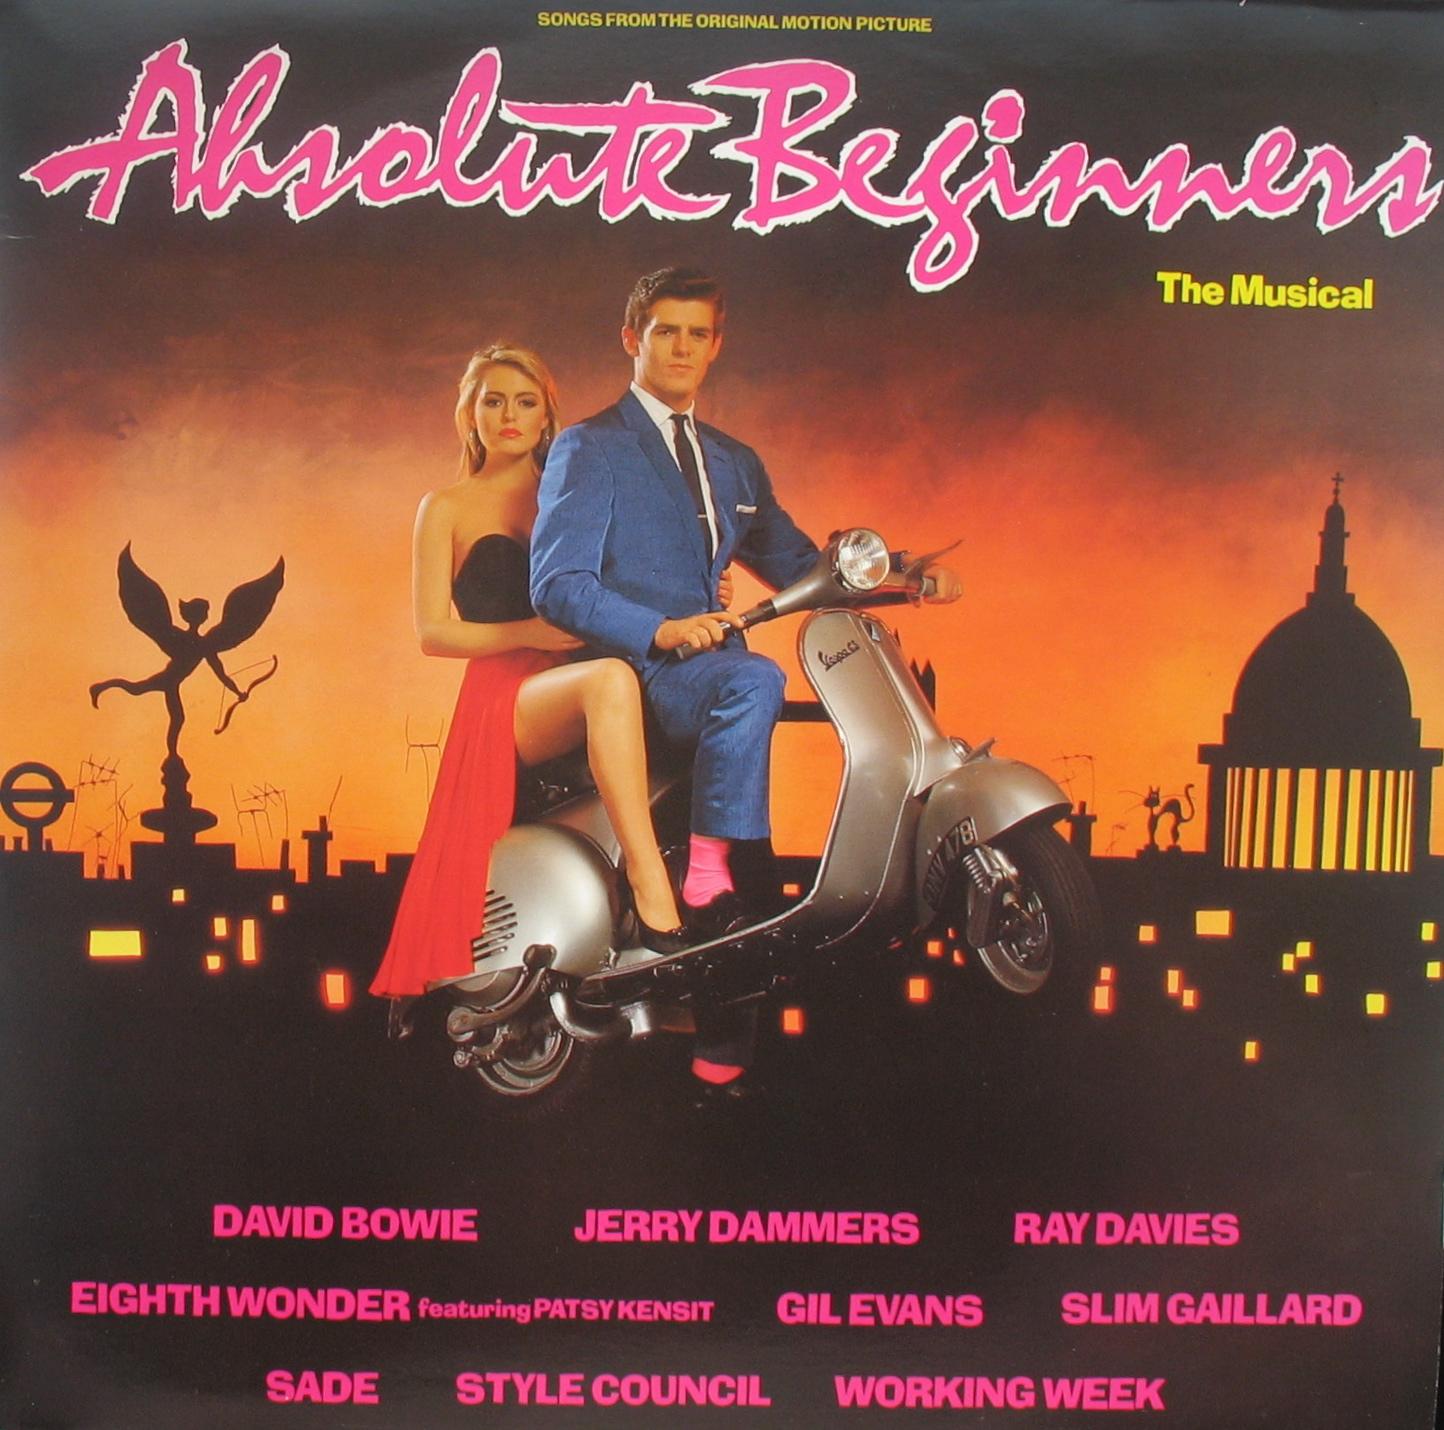 Absolute Beginners Soundtrack (Virgin, 1986).